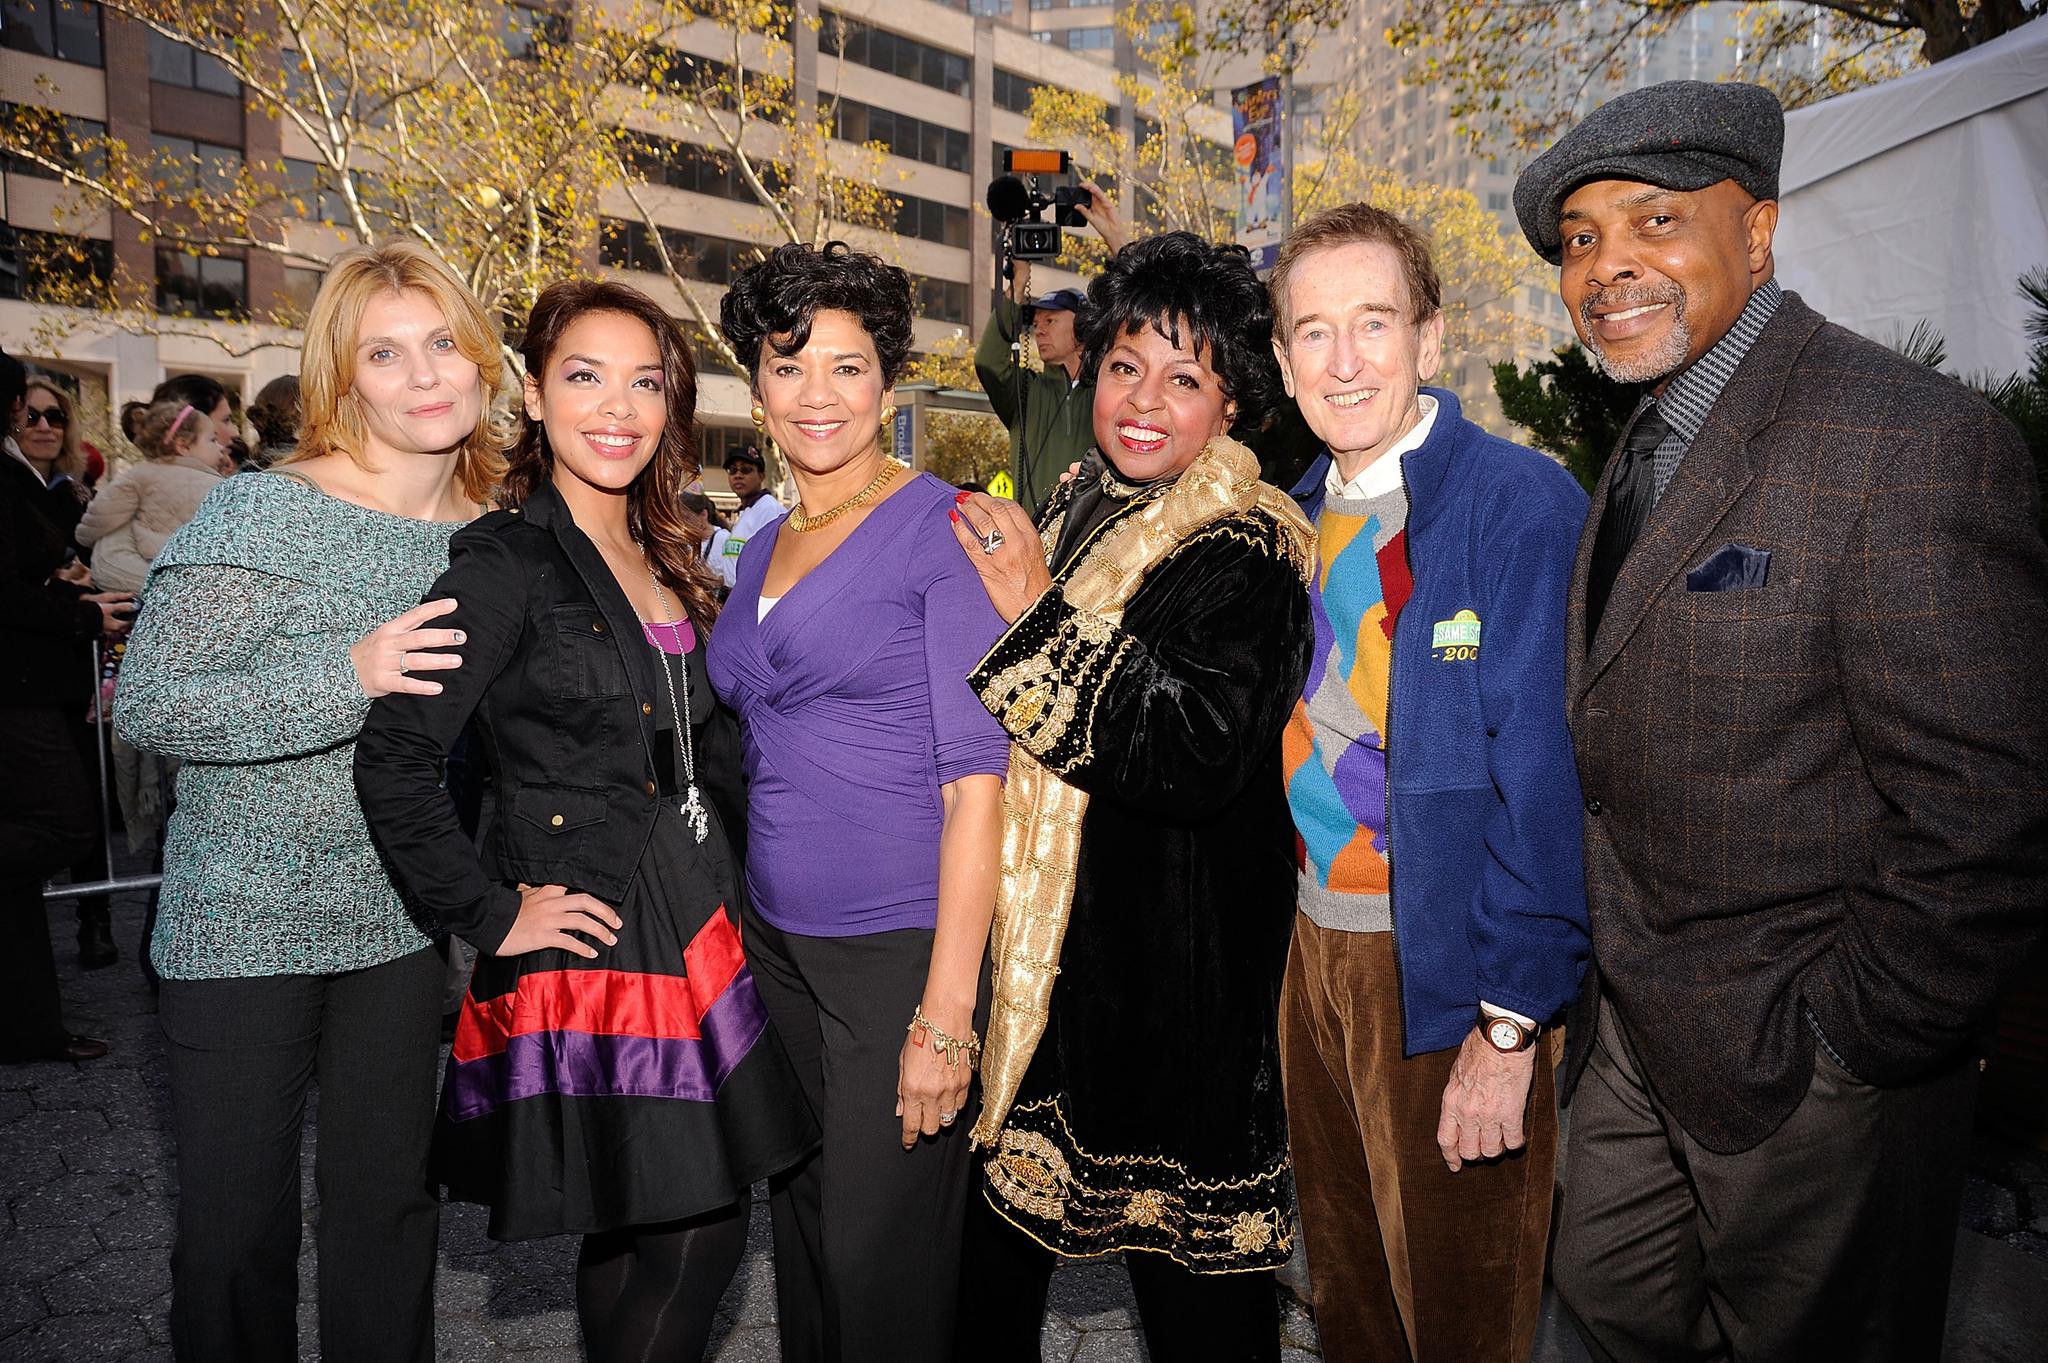 Alison Bartlett, Desiree Casado, Loretta Long, Sonia Manzano, Bob McGrath, and Roscoe Orman at an event for Sesame Street (1969)